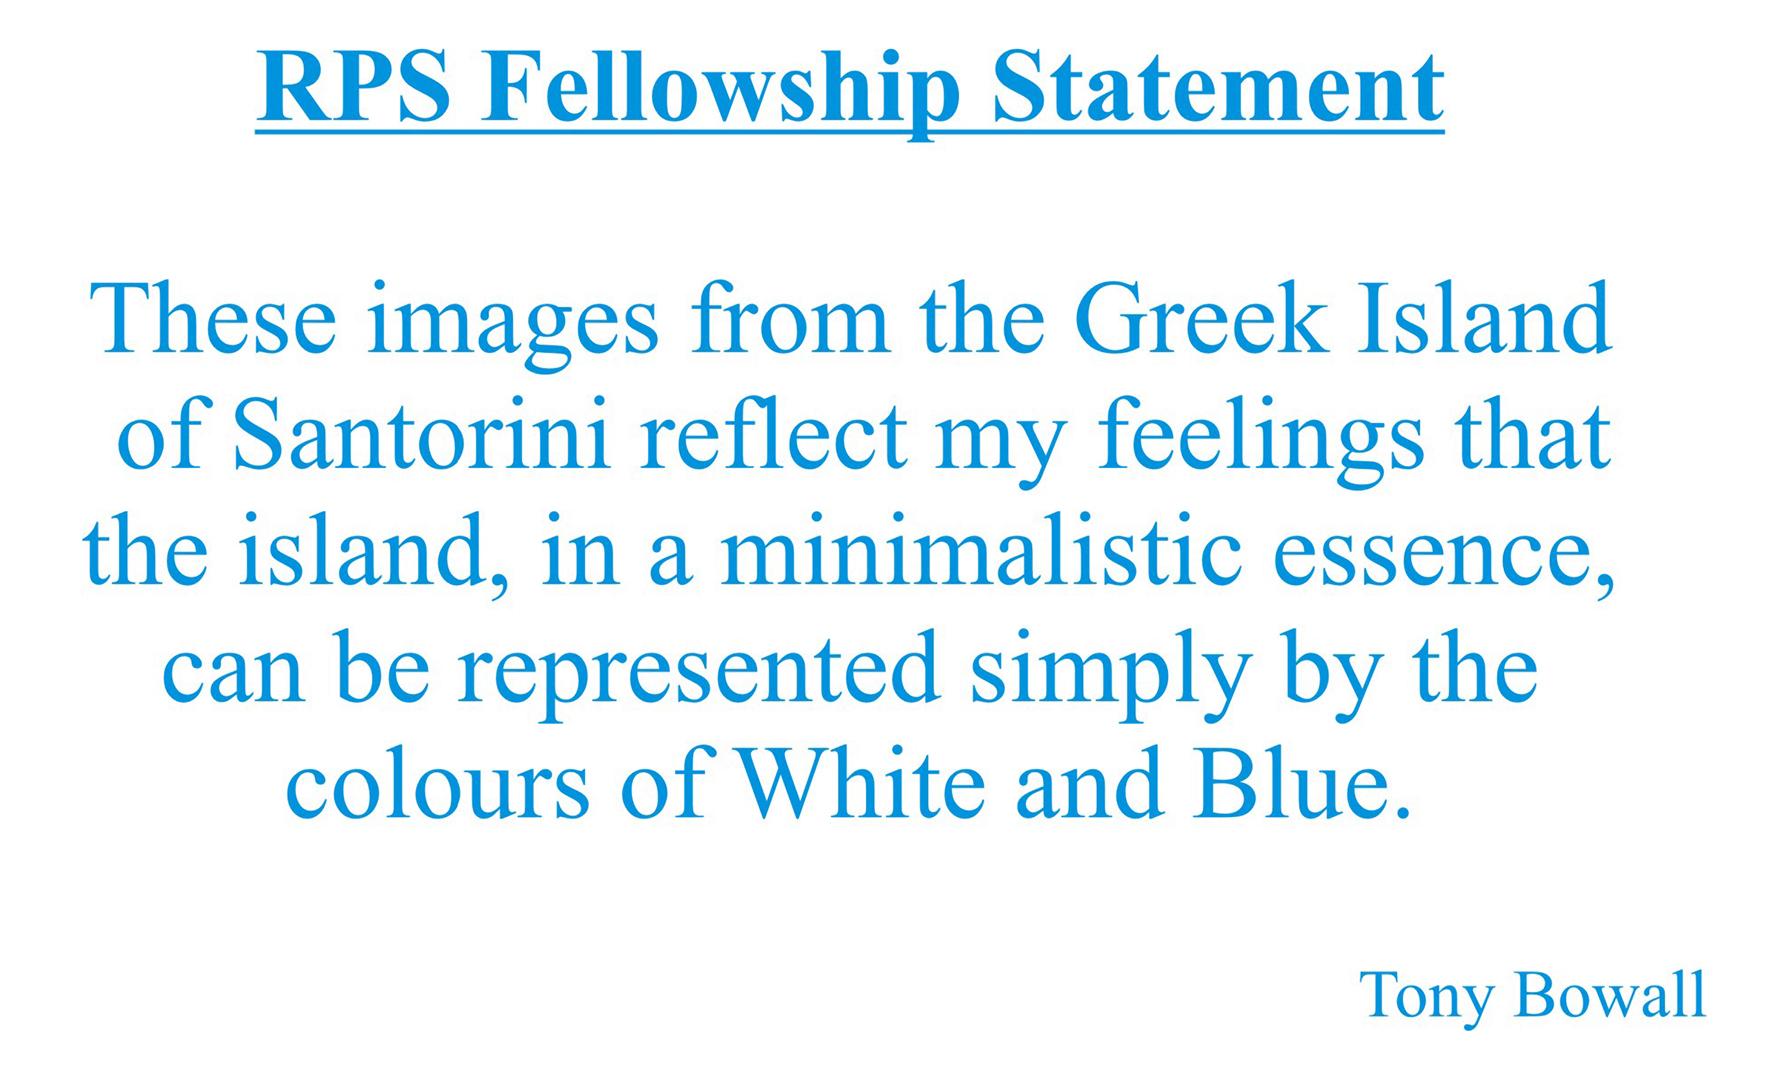 Fellowship Panel Statement